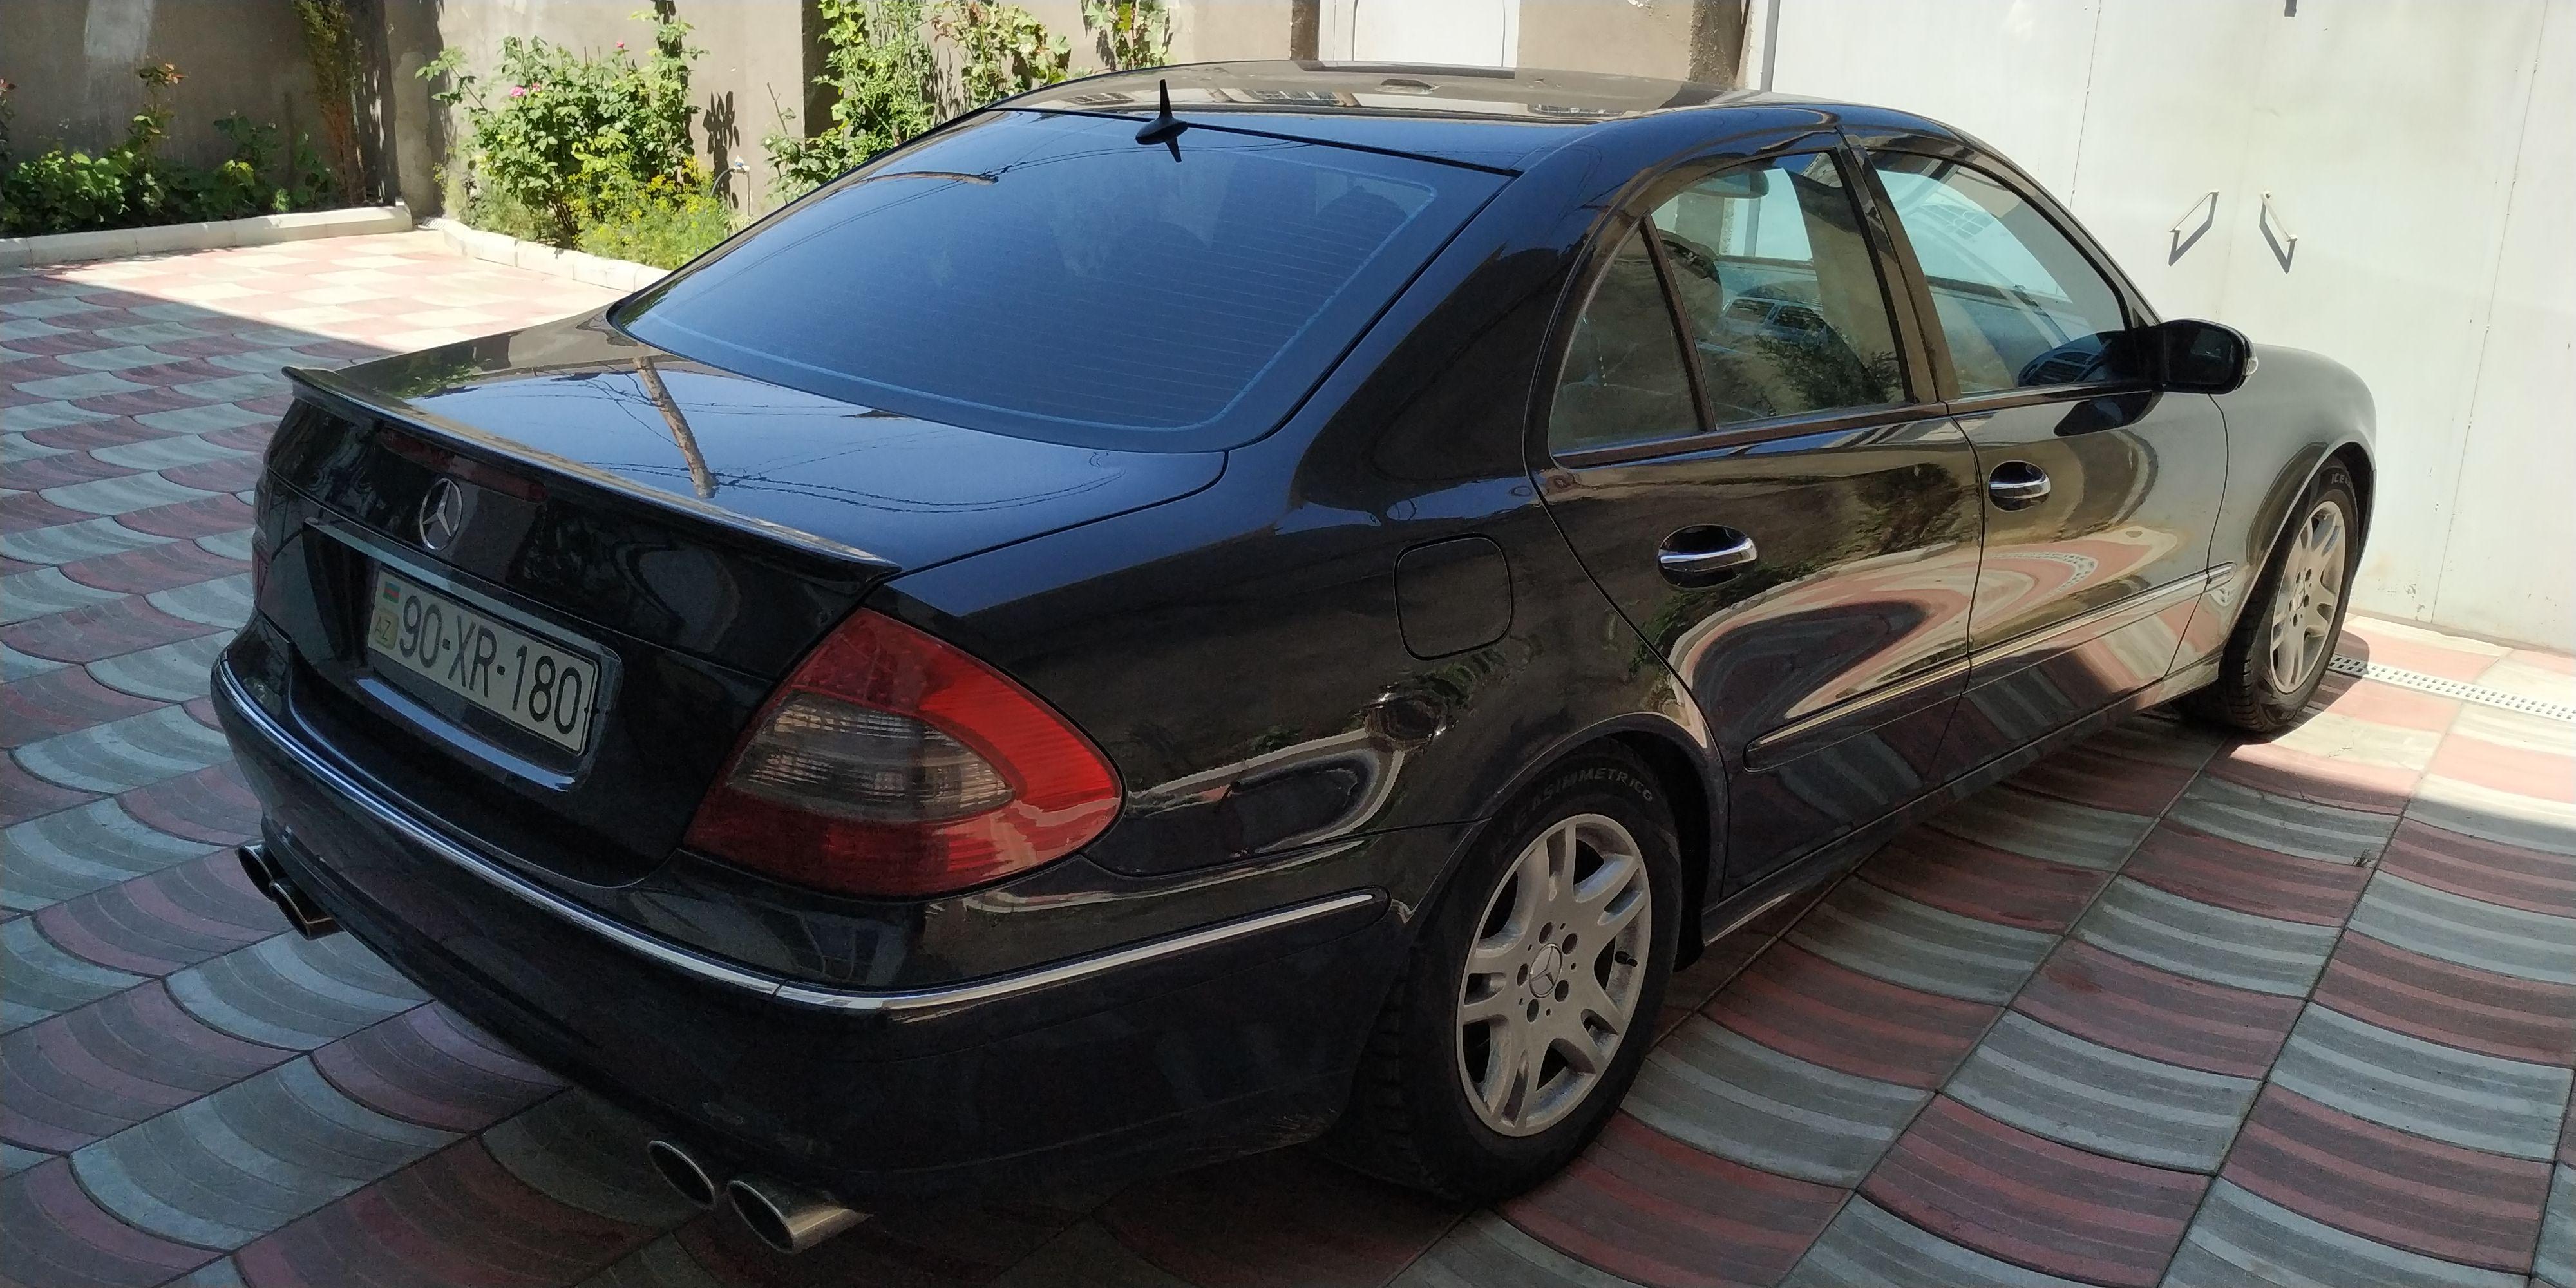 Mercedes-Benz E 320 3.2(lt) 2003 İkinci əl  $15200